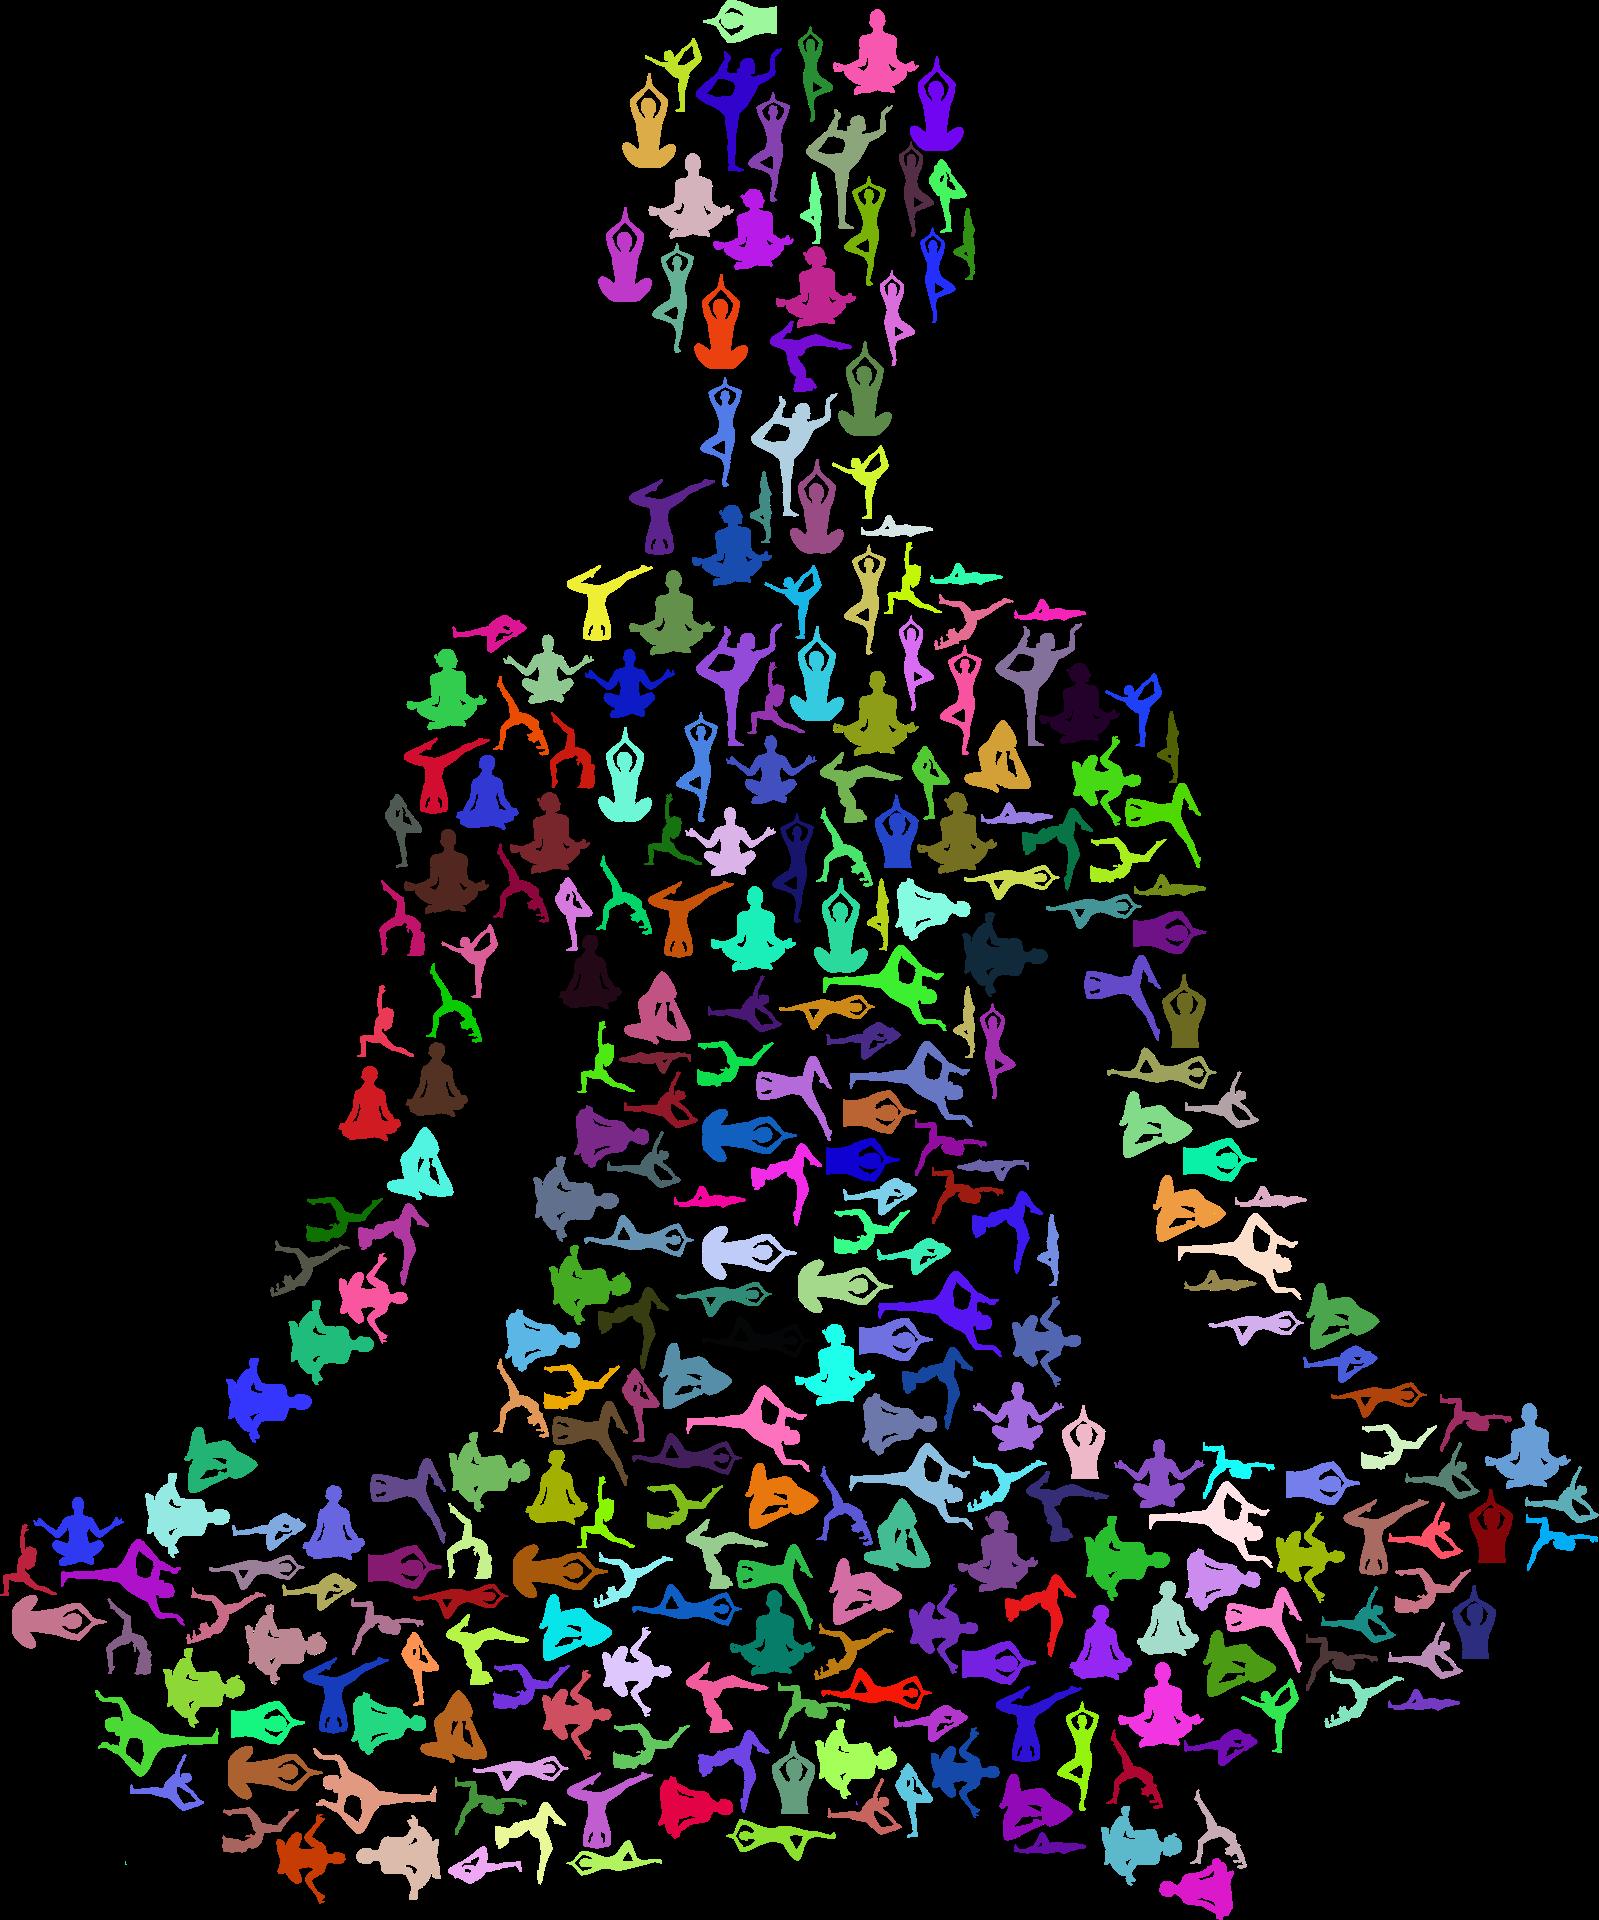 Chakras; yoga; meditation; seven chakras; root chakra; sacral chakra; solar plexus chackra; heart chakra; throat chakra; third eye; crown chakra; Muladhara; Svadhishthana; Manipura; Anahata; Vishuddha; Ajna; Sahasrara; breathing; balanced charkas; how many chakras; balance your chakras; Kundalini Yoga; Kriya Yoga.